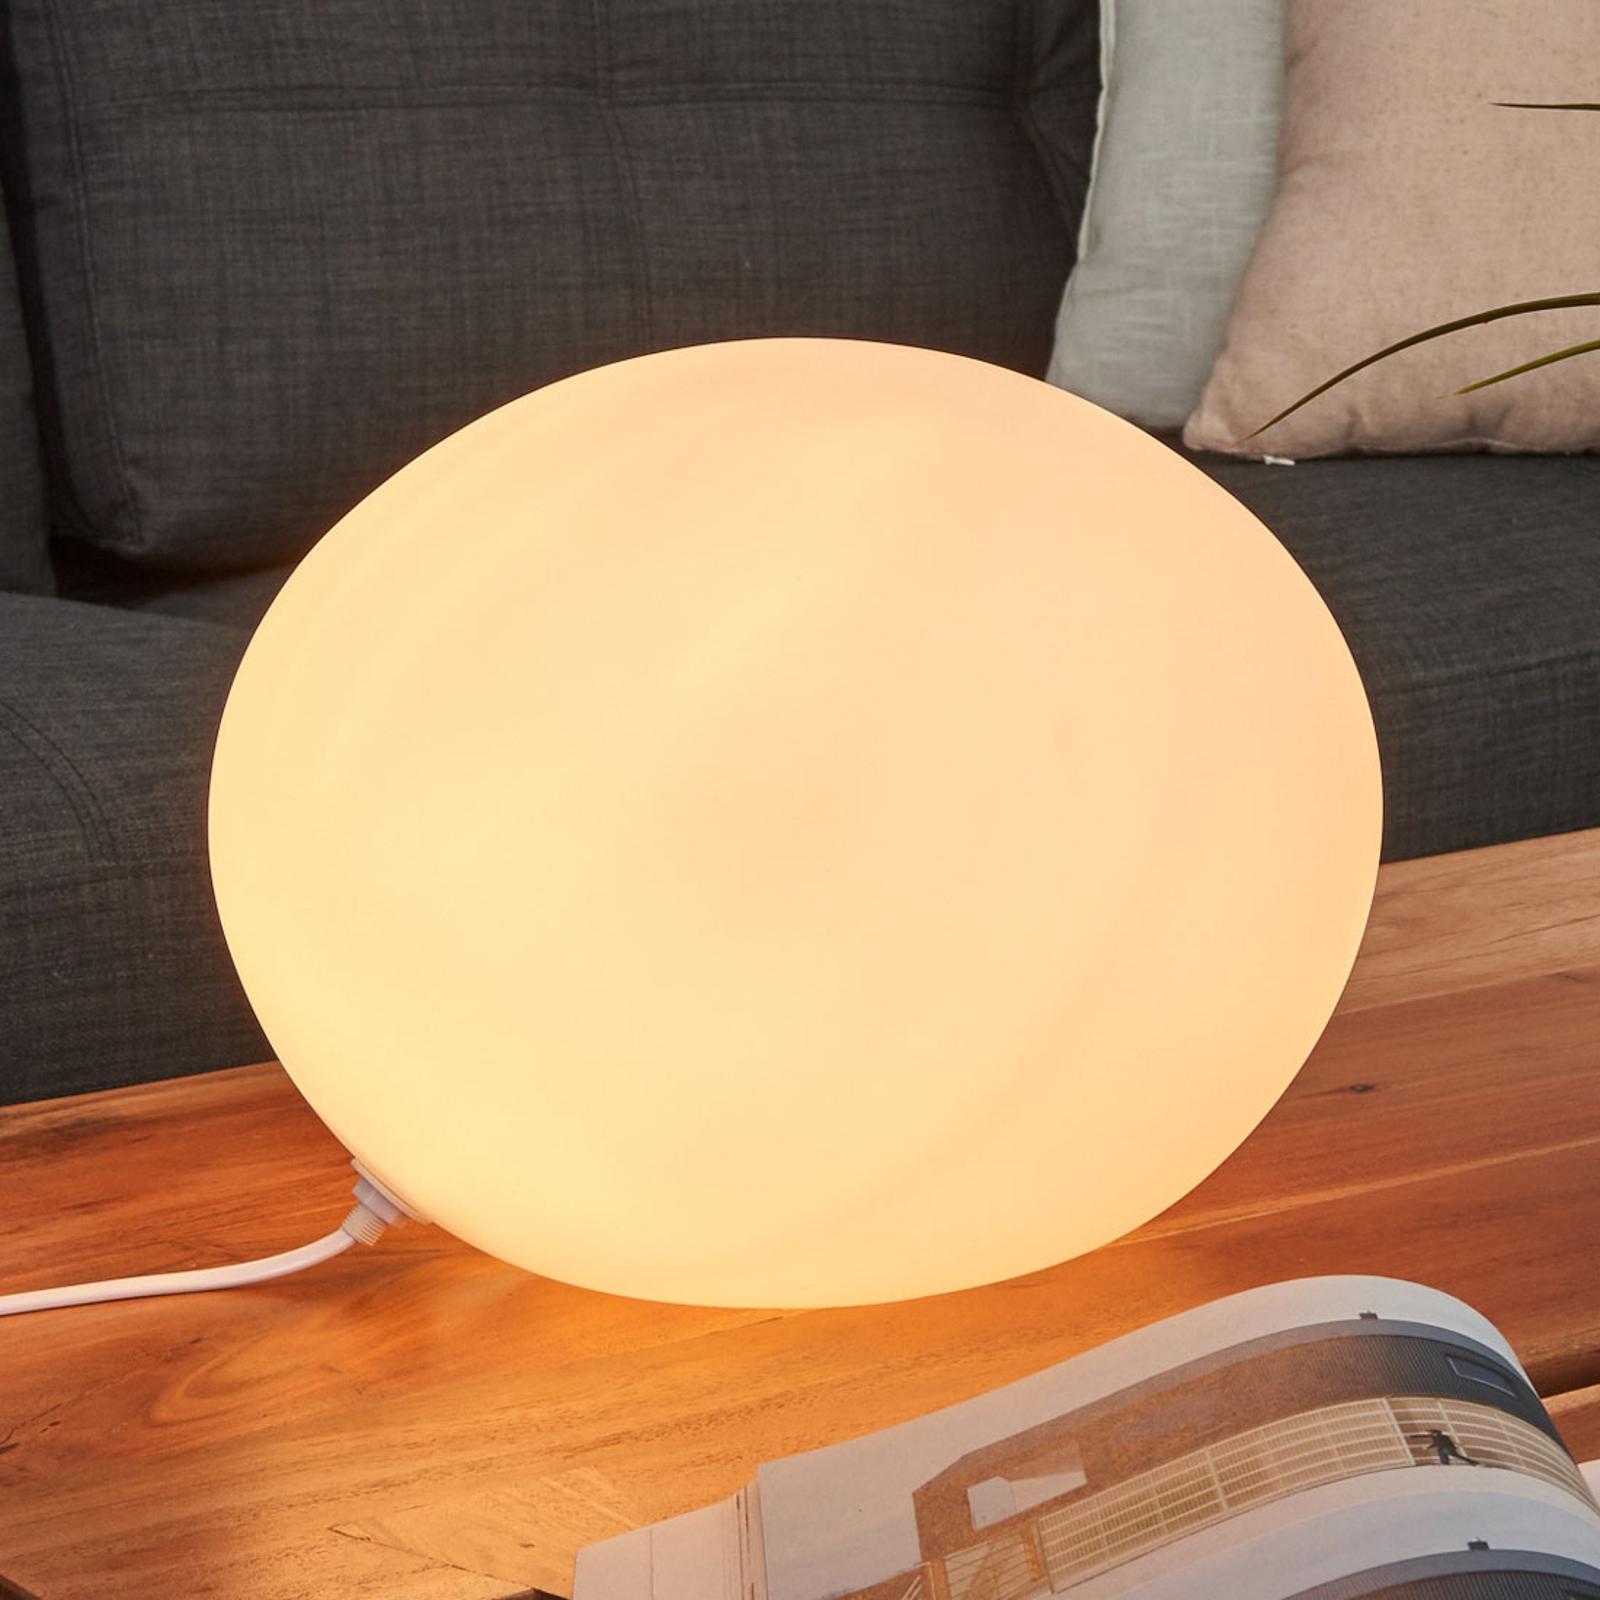 Lampe à poser Verre Ovale Ø 30 cm